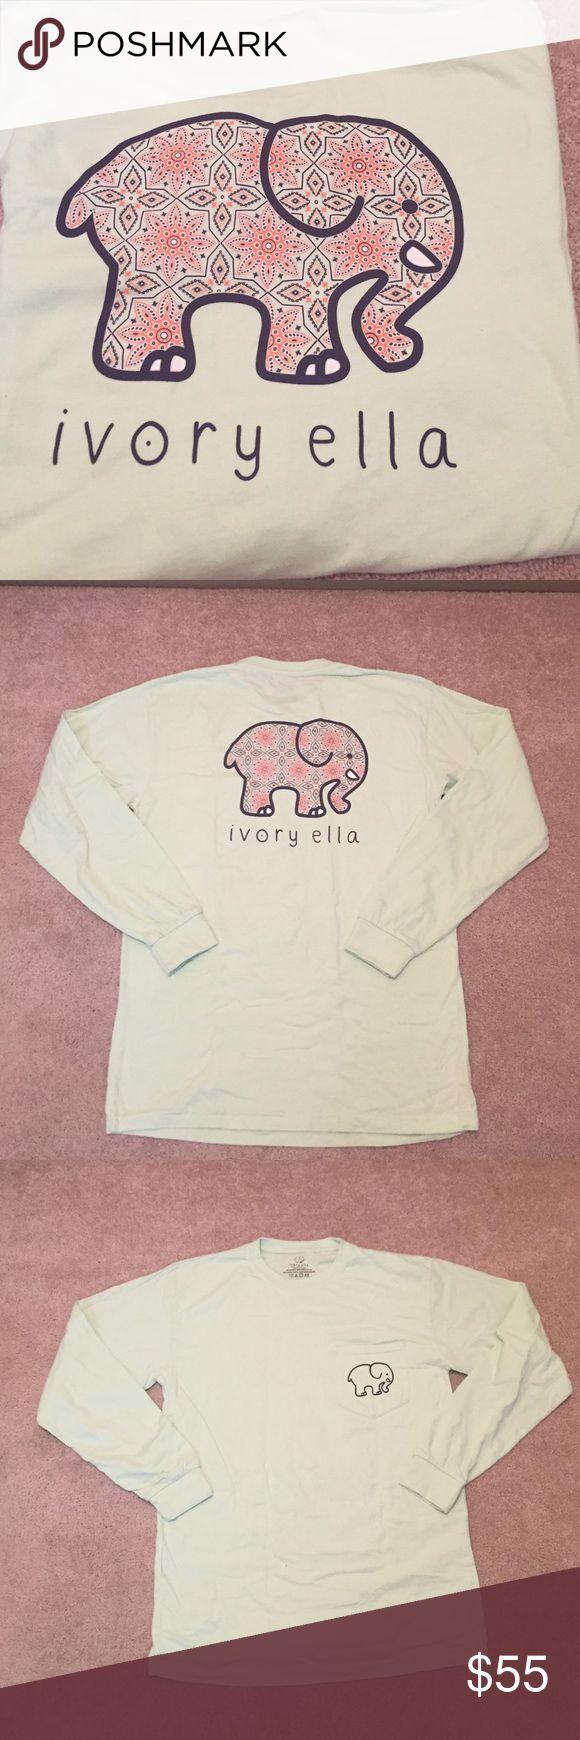 d5e8d850d3fb Amazon.com  ivory ella - Clothing   Women  Clothing